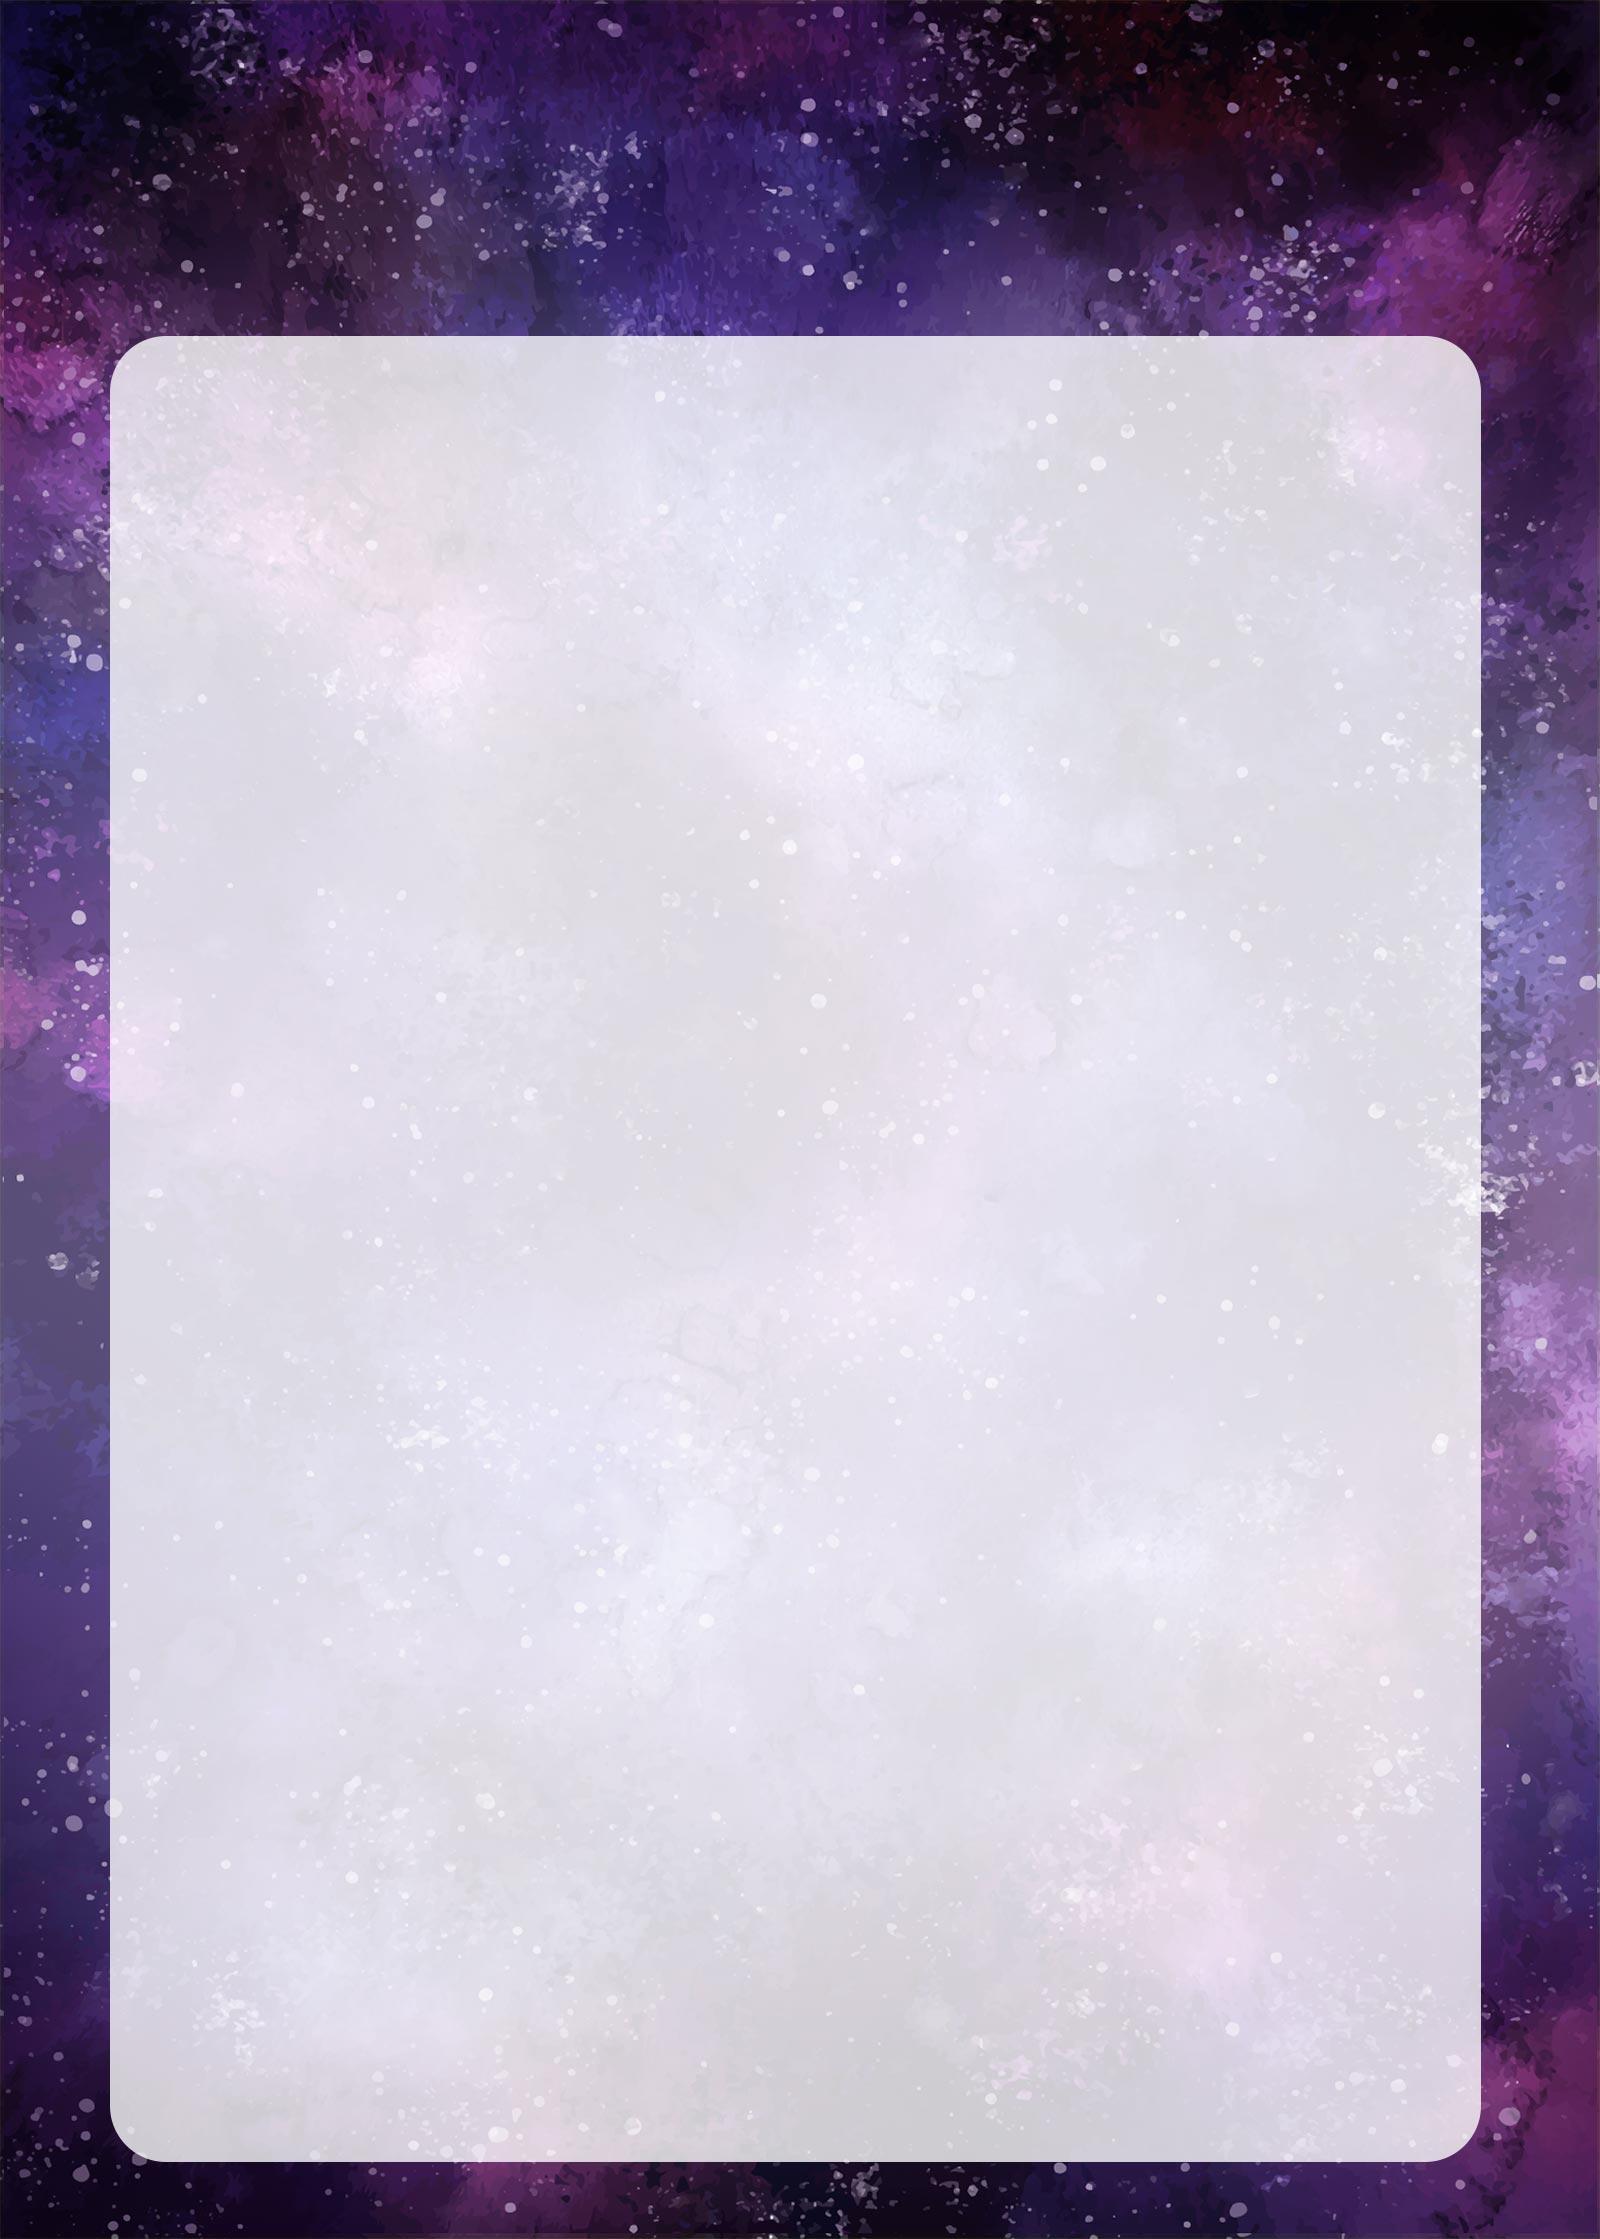 Planner Galaxia Lilas Molde em Branco